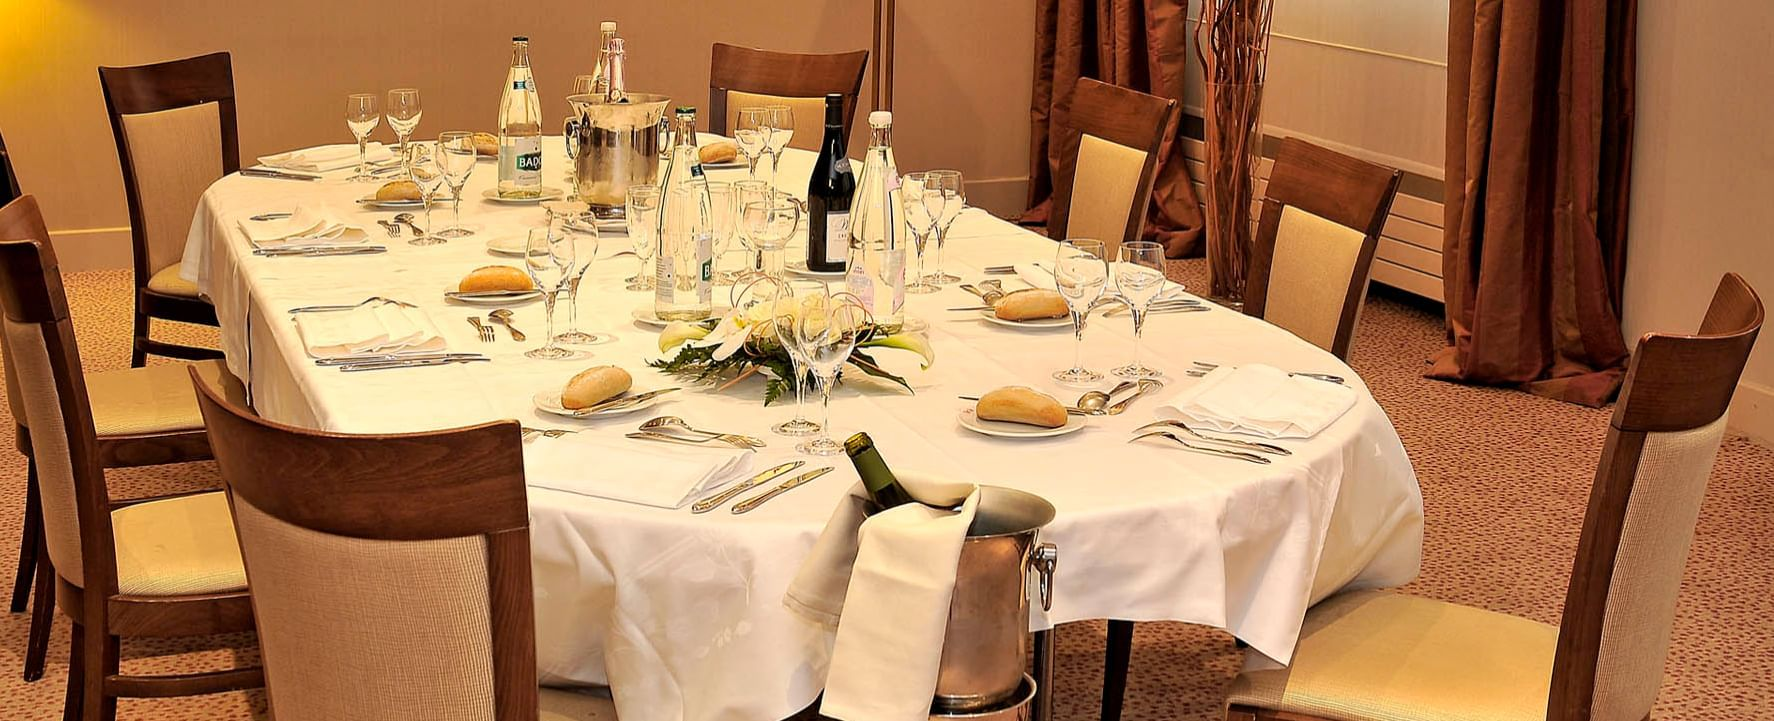 Banquet table close-up